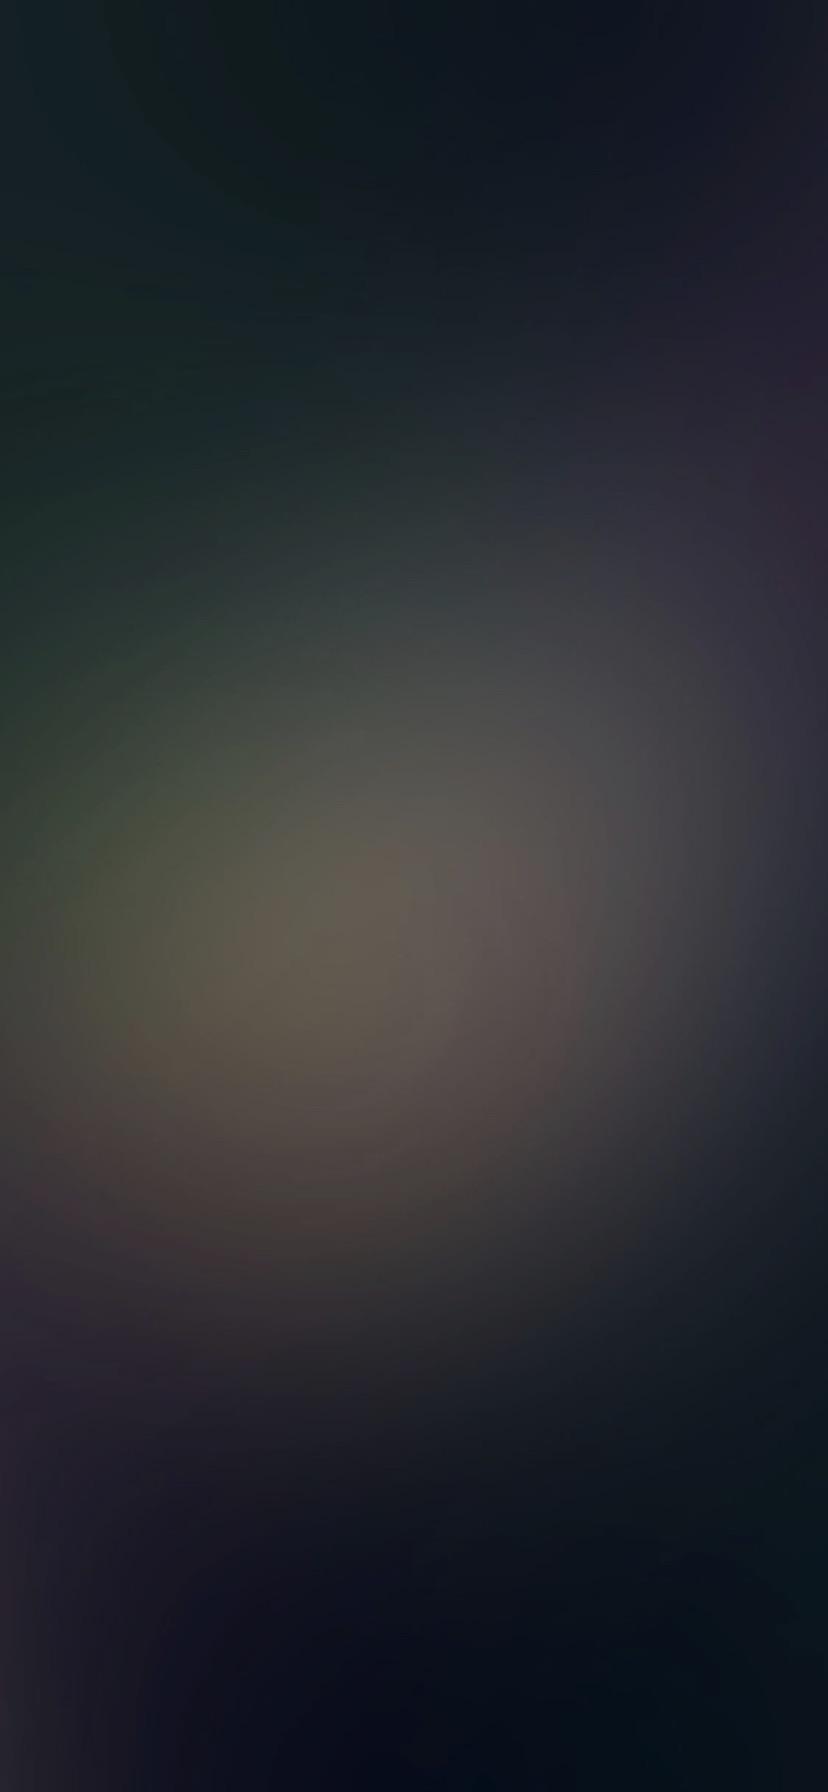 iPhone XR 壁紙 wallpaper 0975